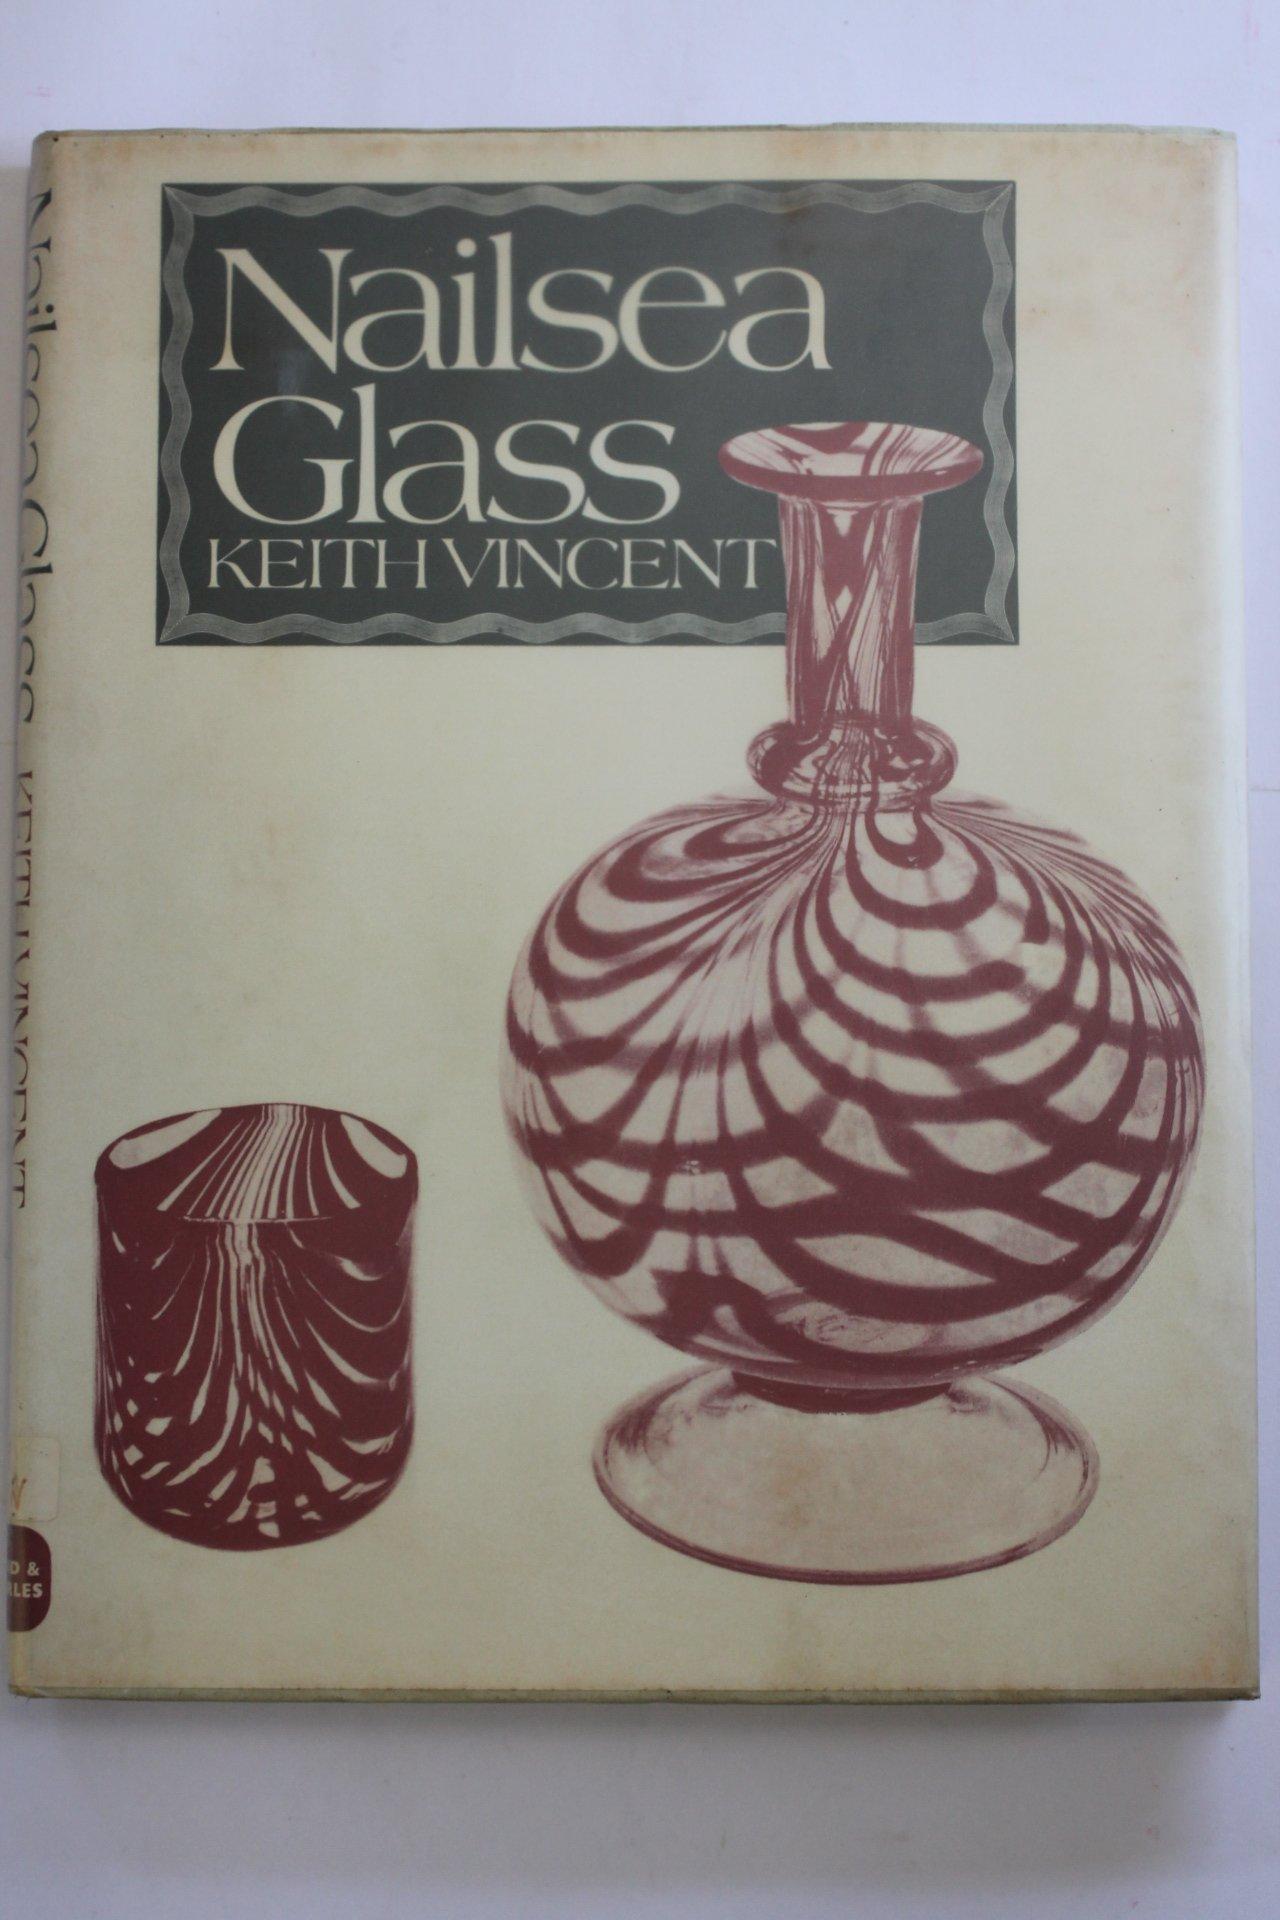 Nailsea Glass